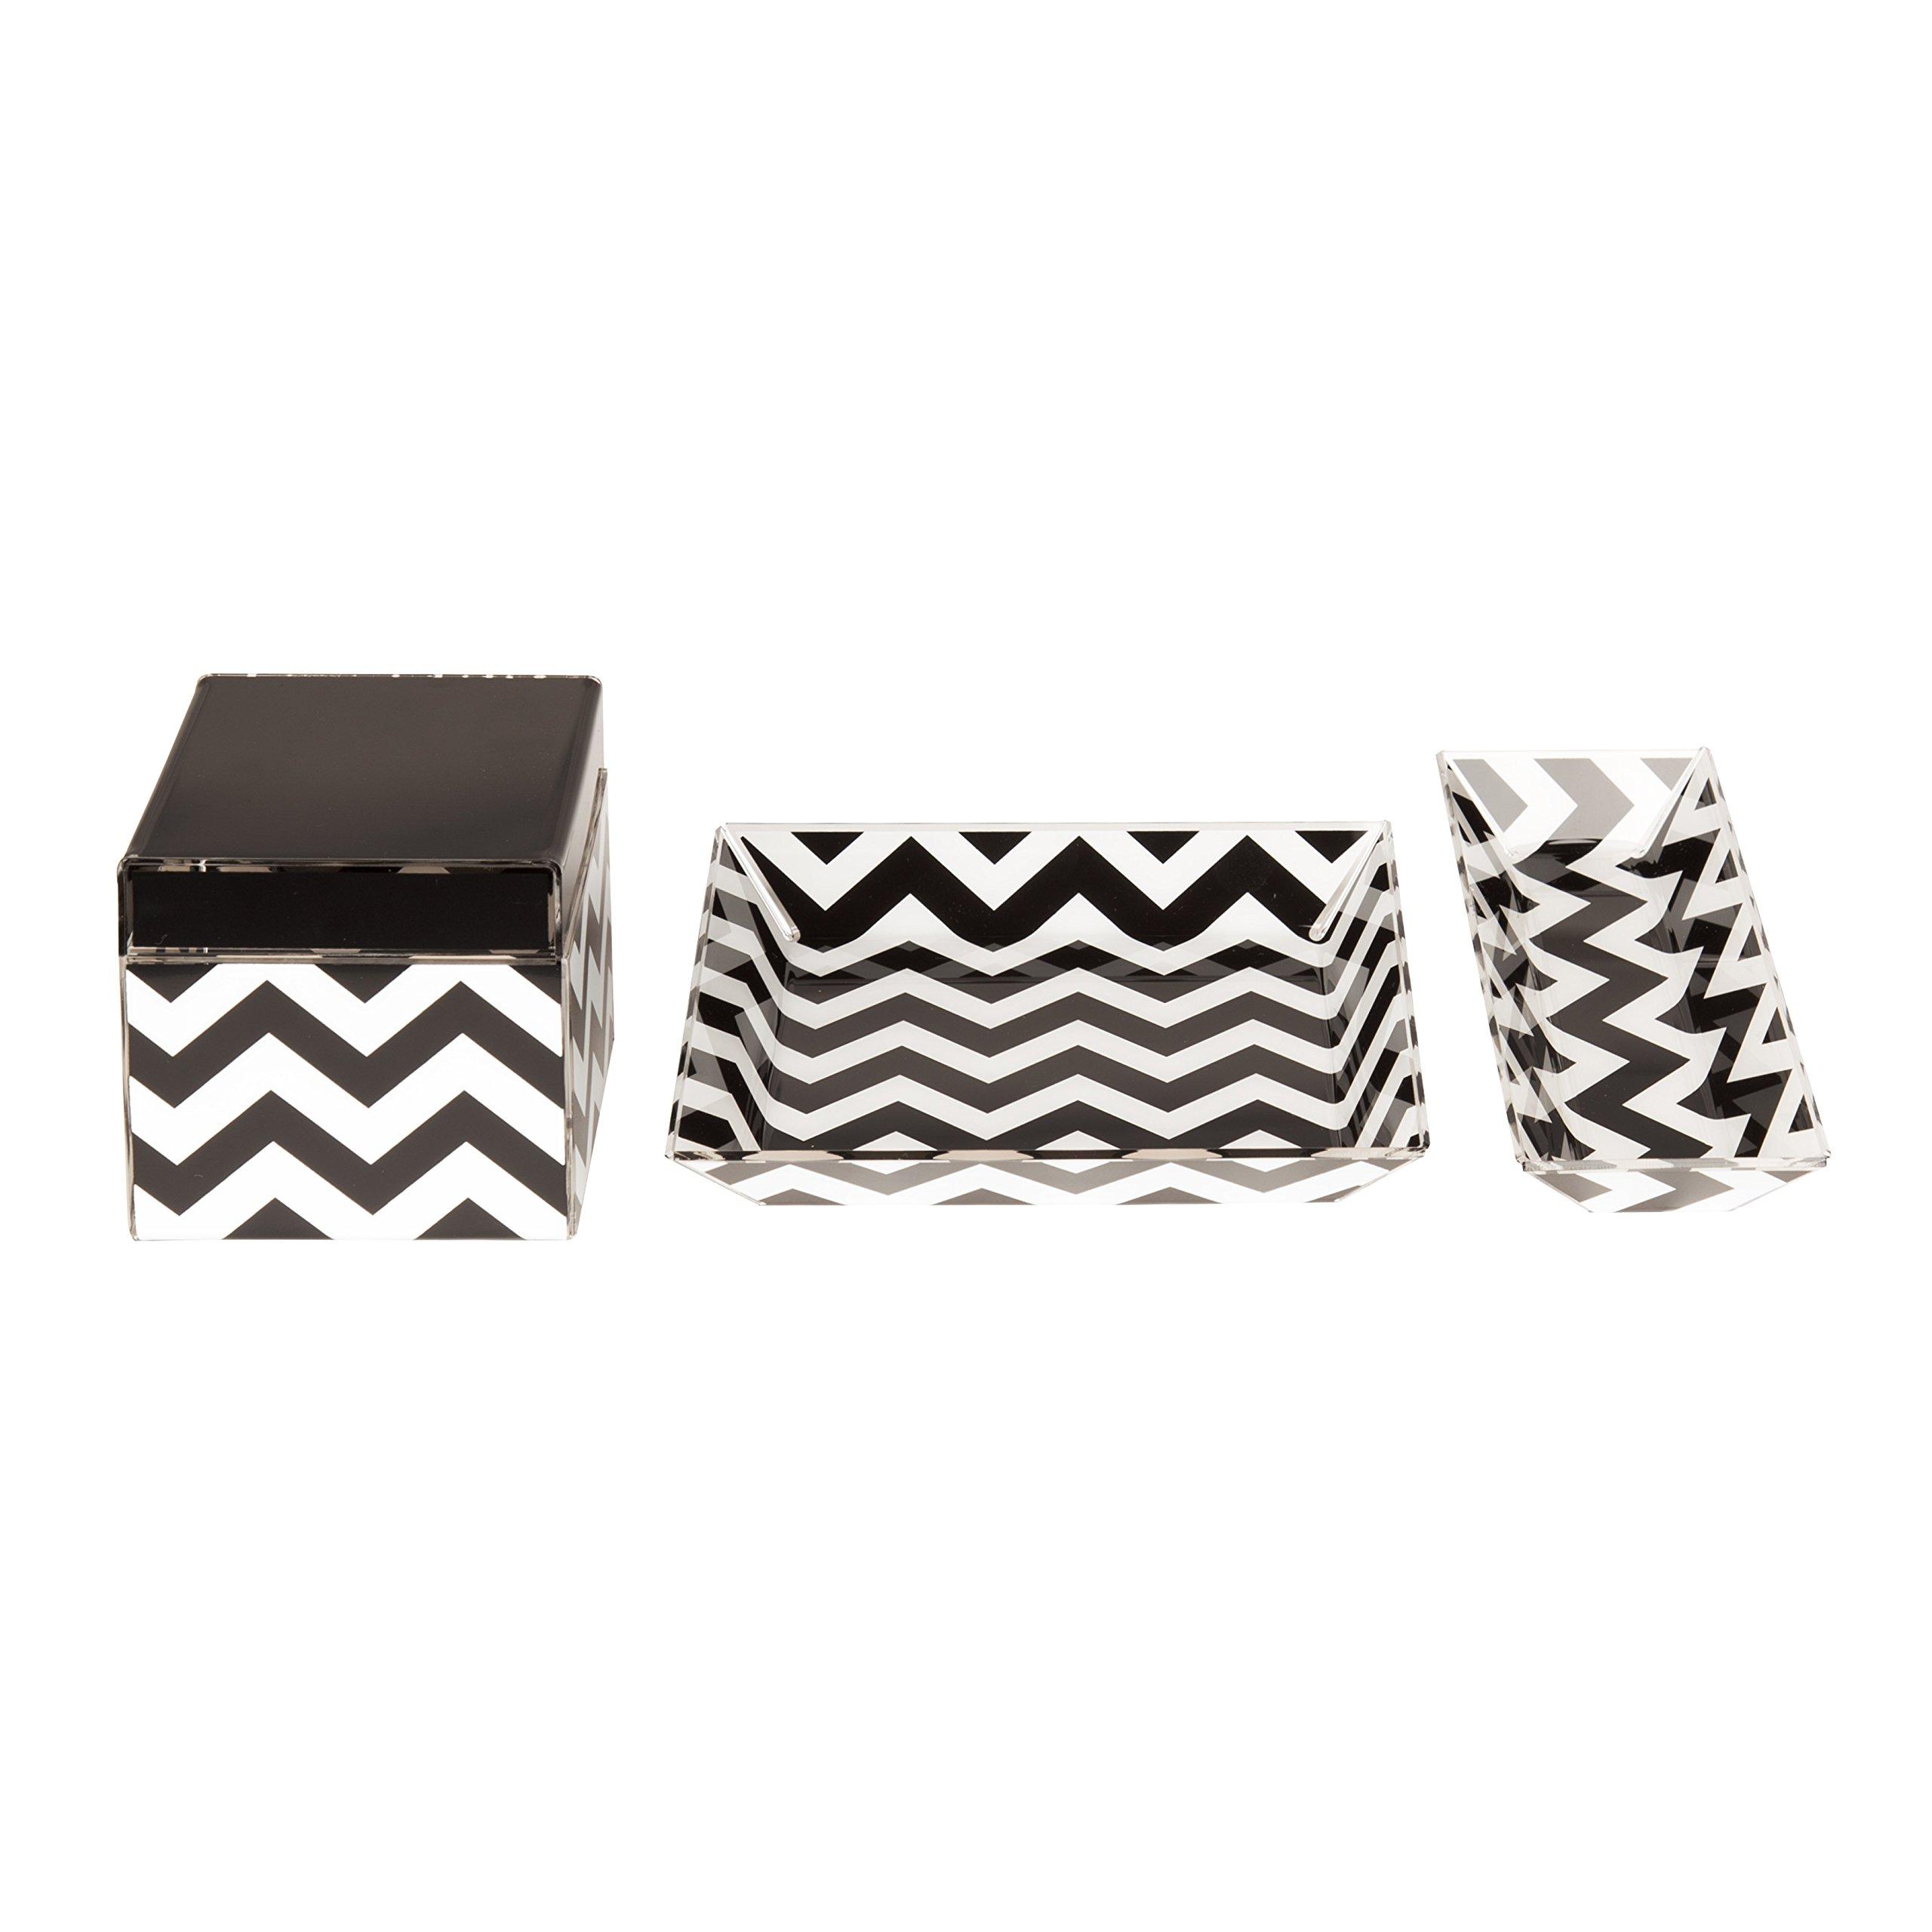 Kate and Laurel Luxe Chevron 3 Piece Acrylic Desk Organizer Set, Black and White